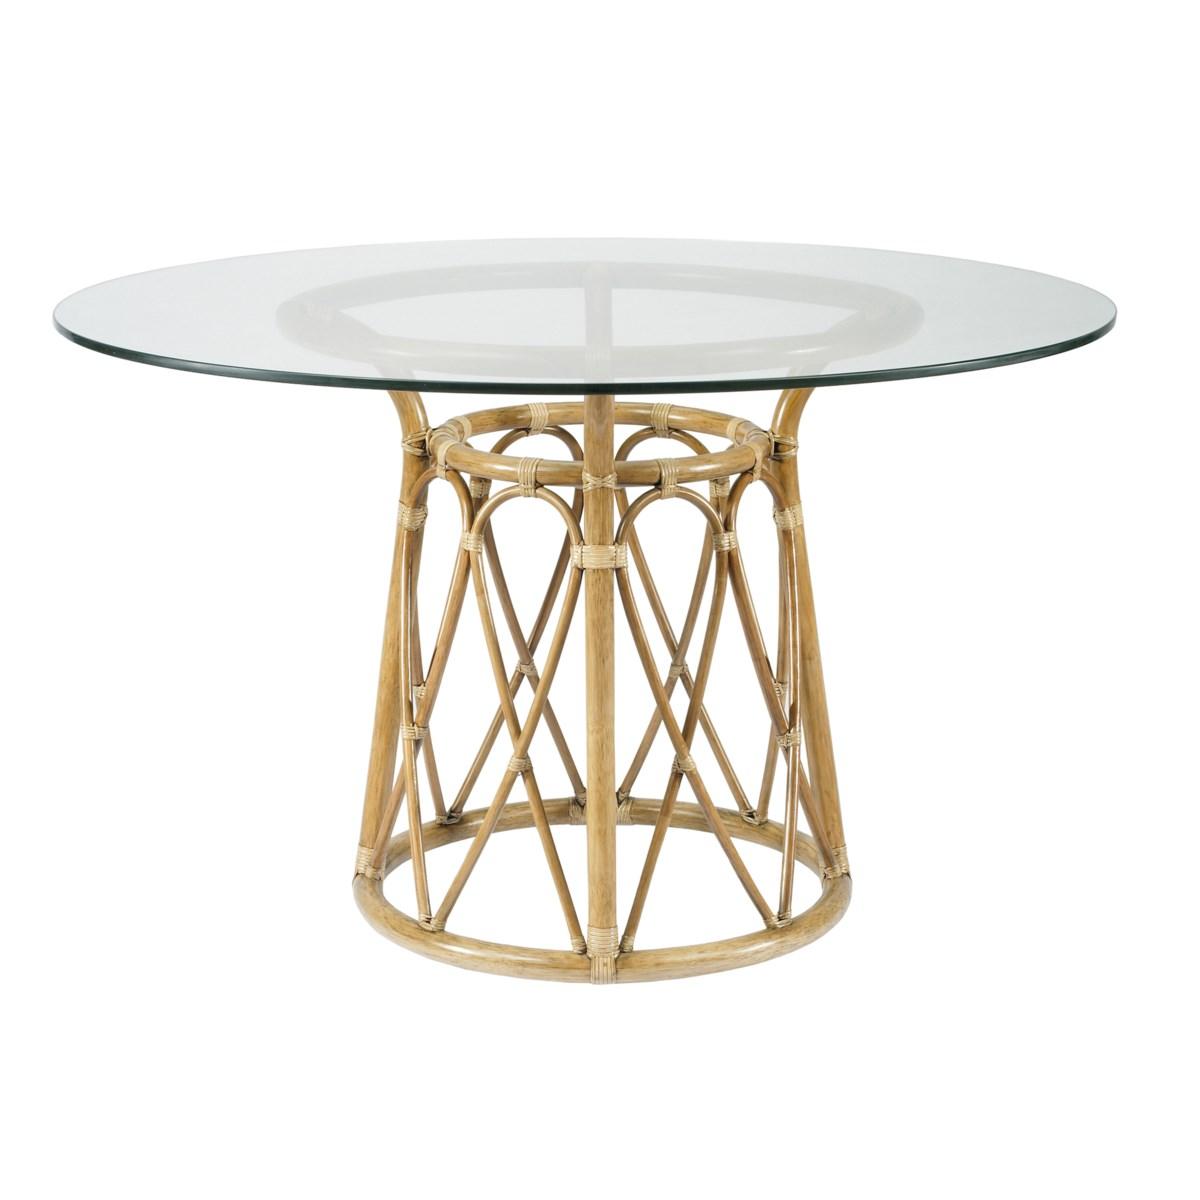 Sona Dining Table Base in Nutmeg